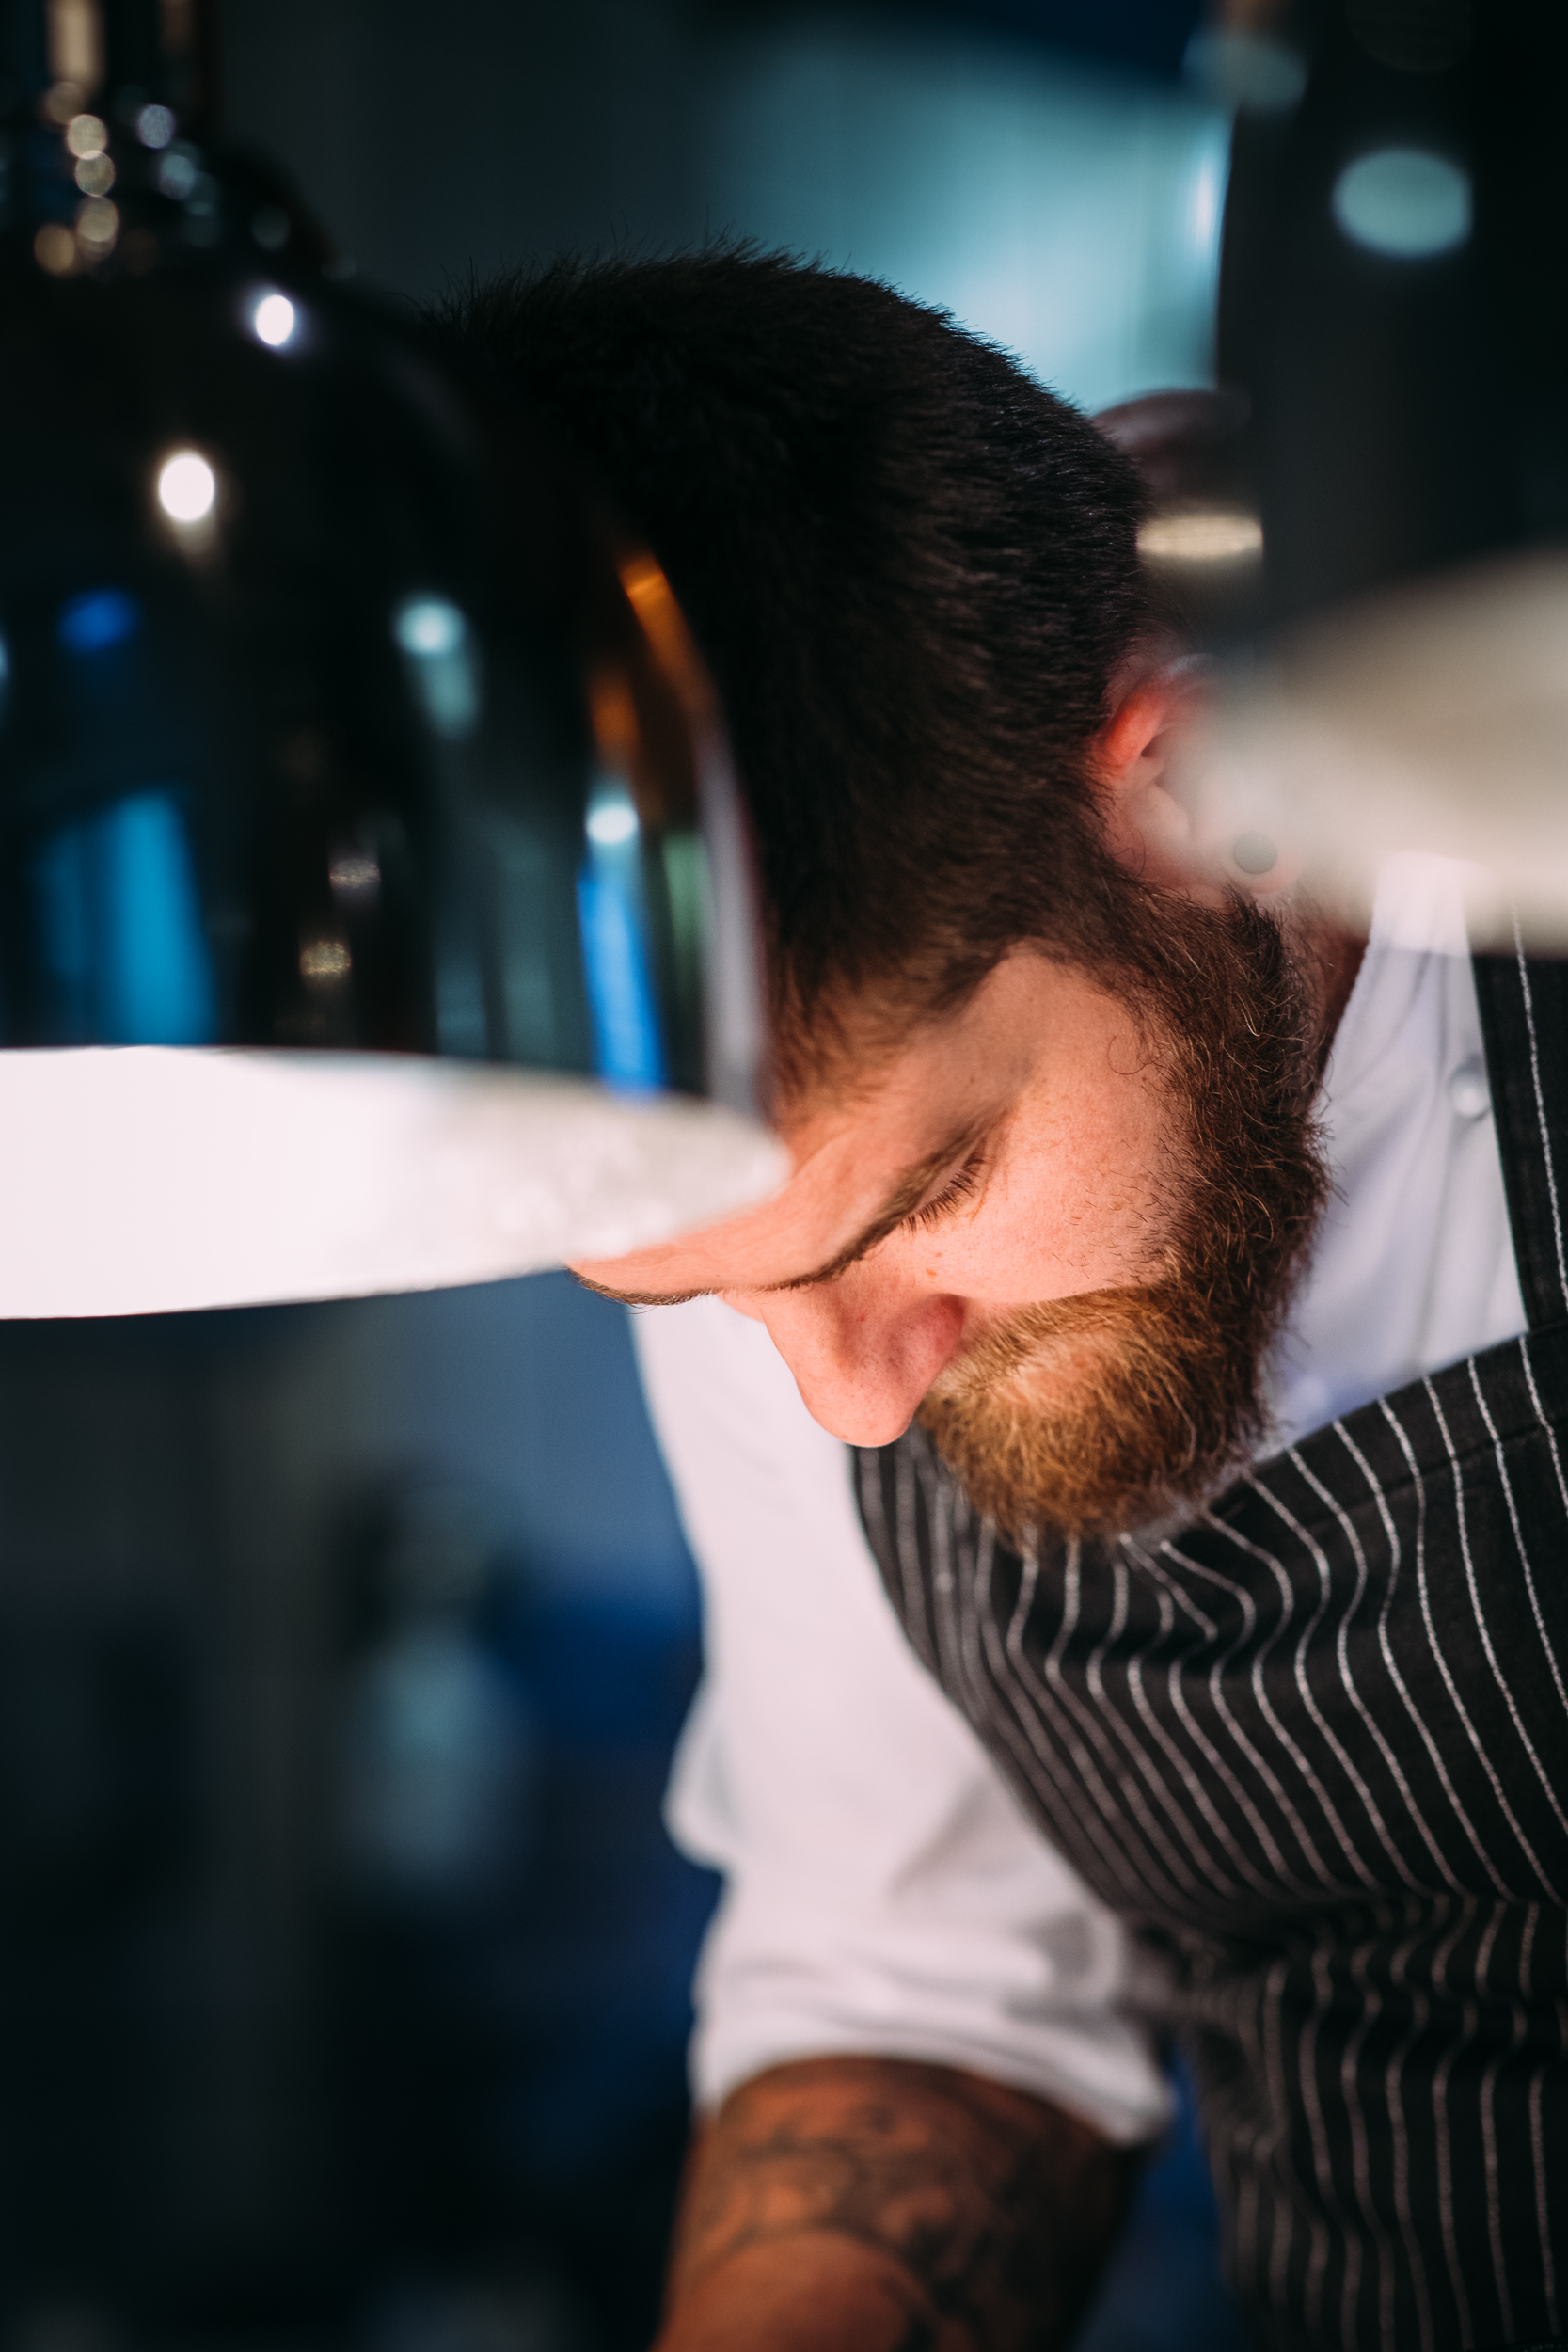 Kevin Grobler, Delaire Graff Restaurant Executive Chef